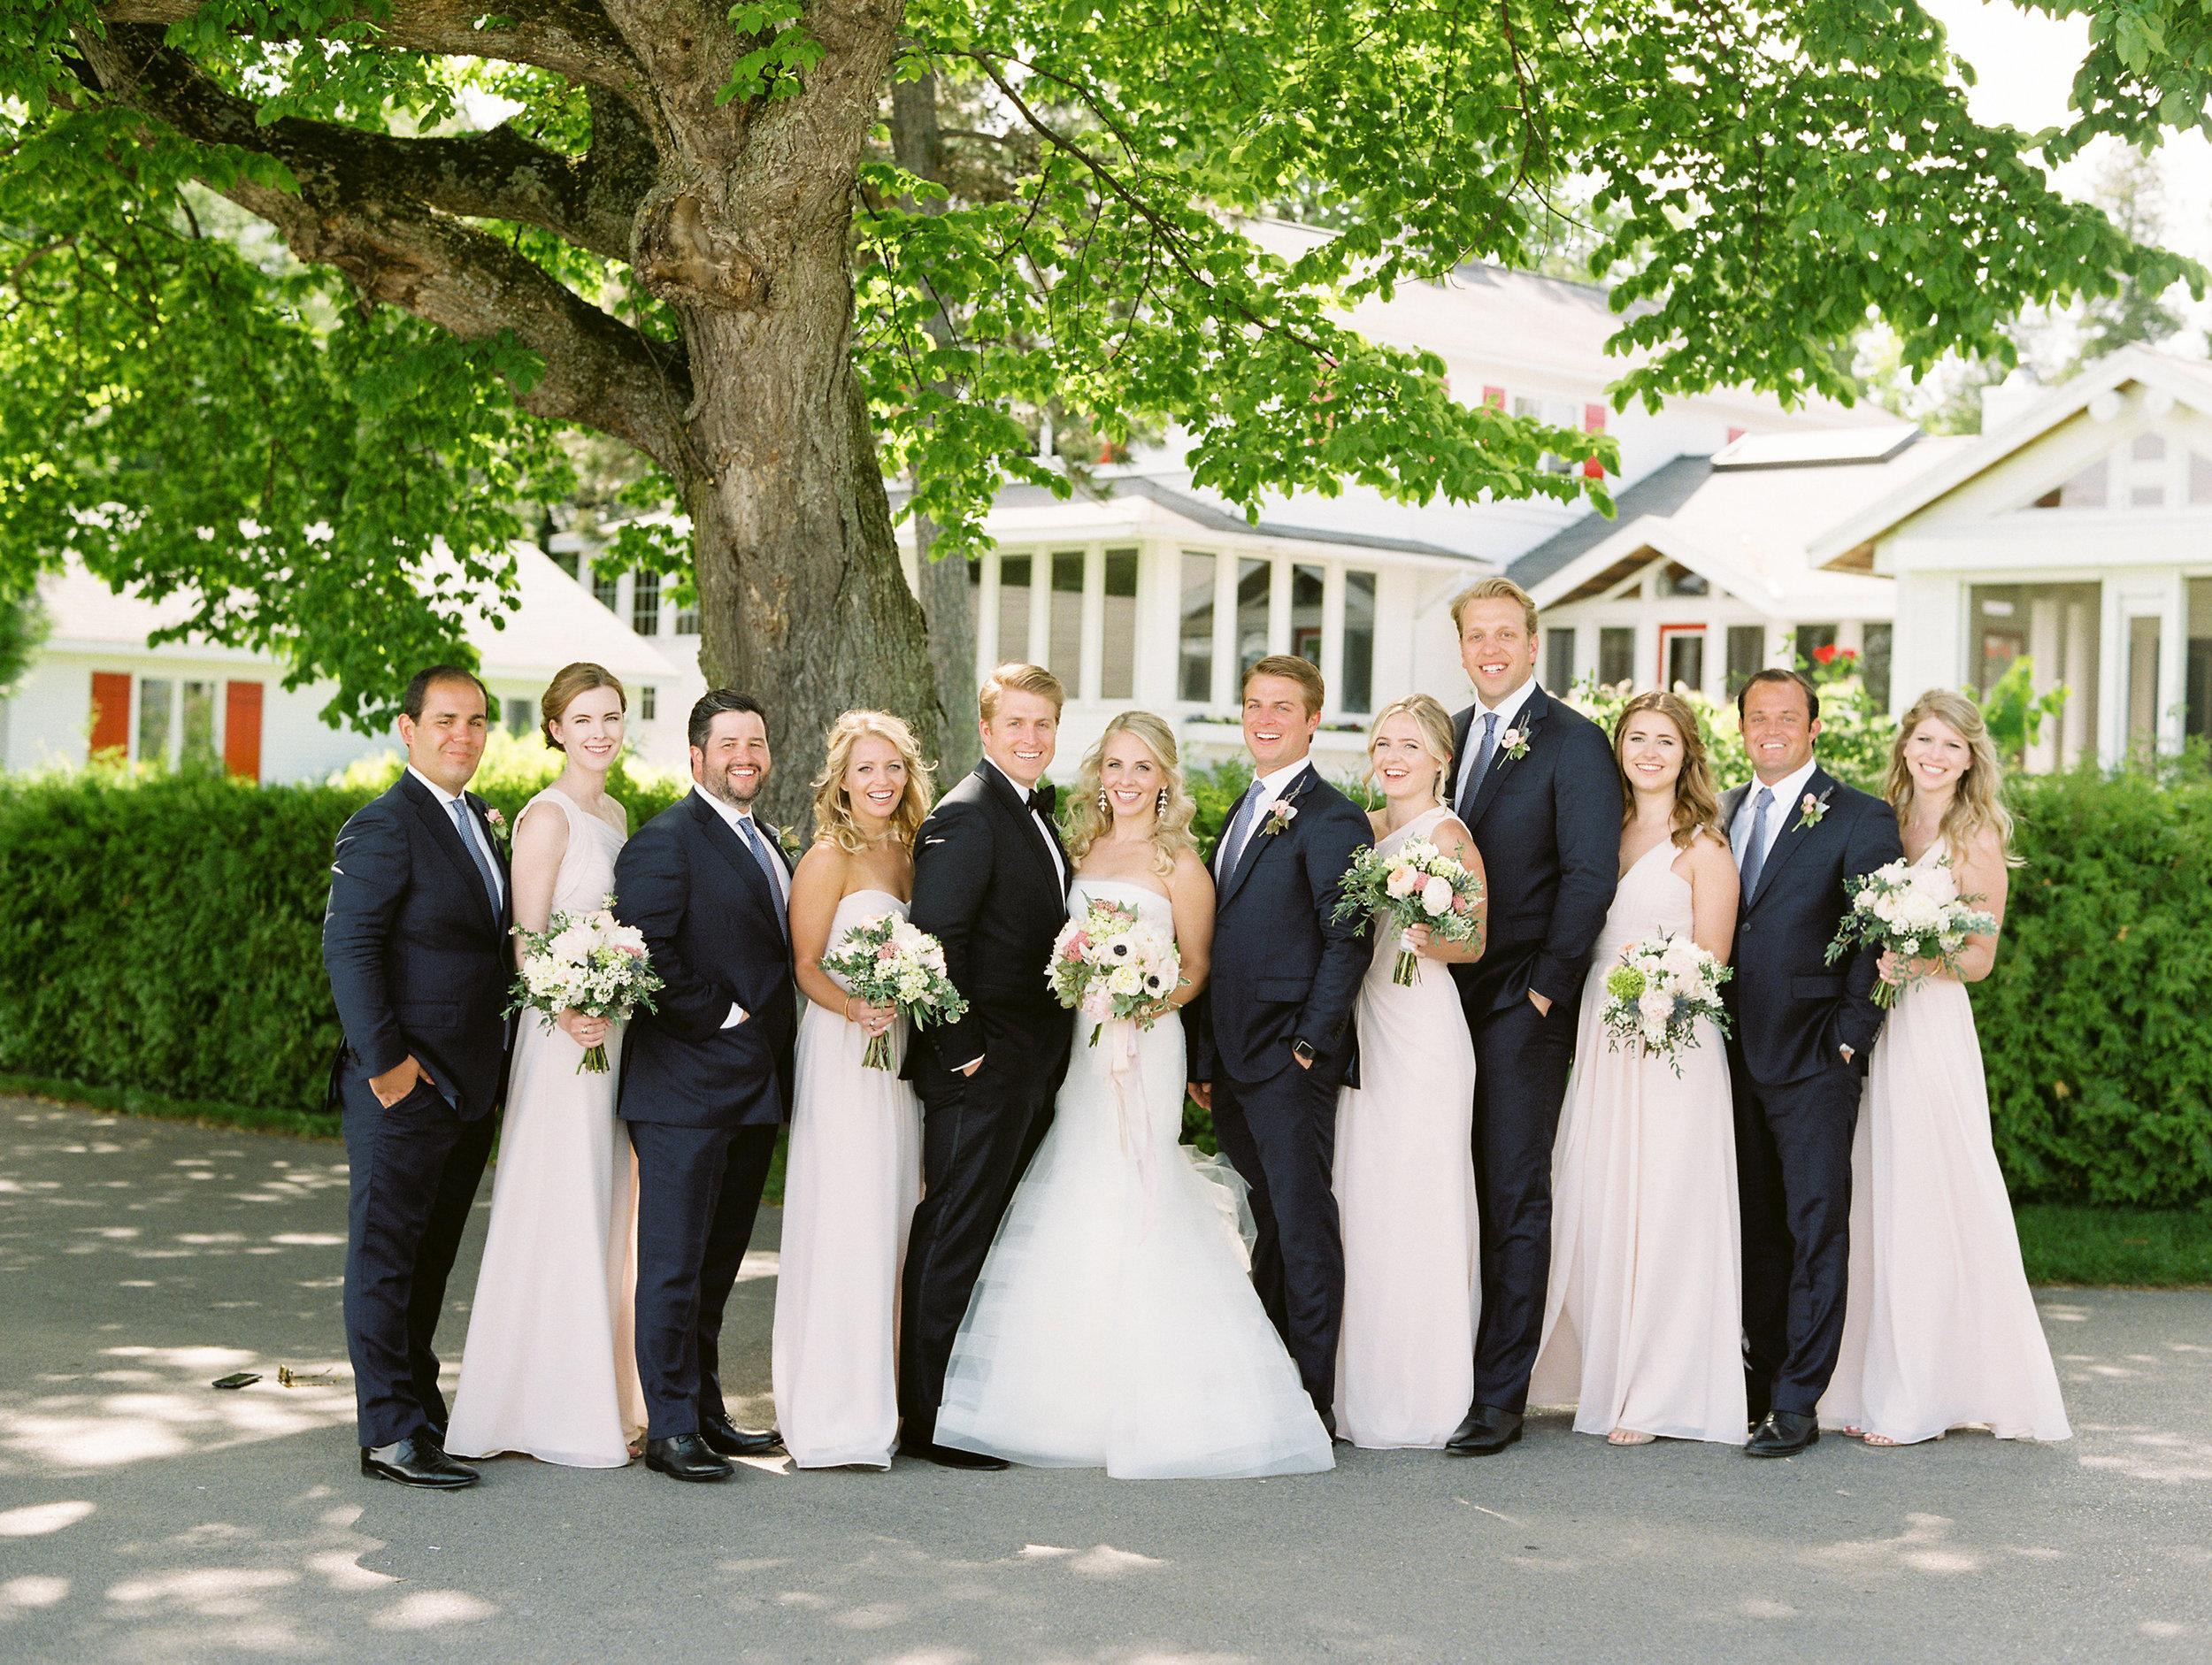 Coffman+Wedding+Bridal+Party-33.jpg